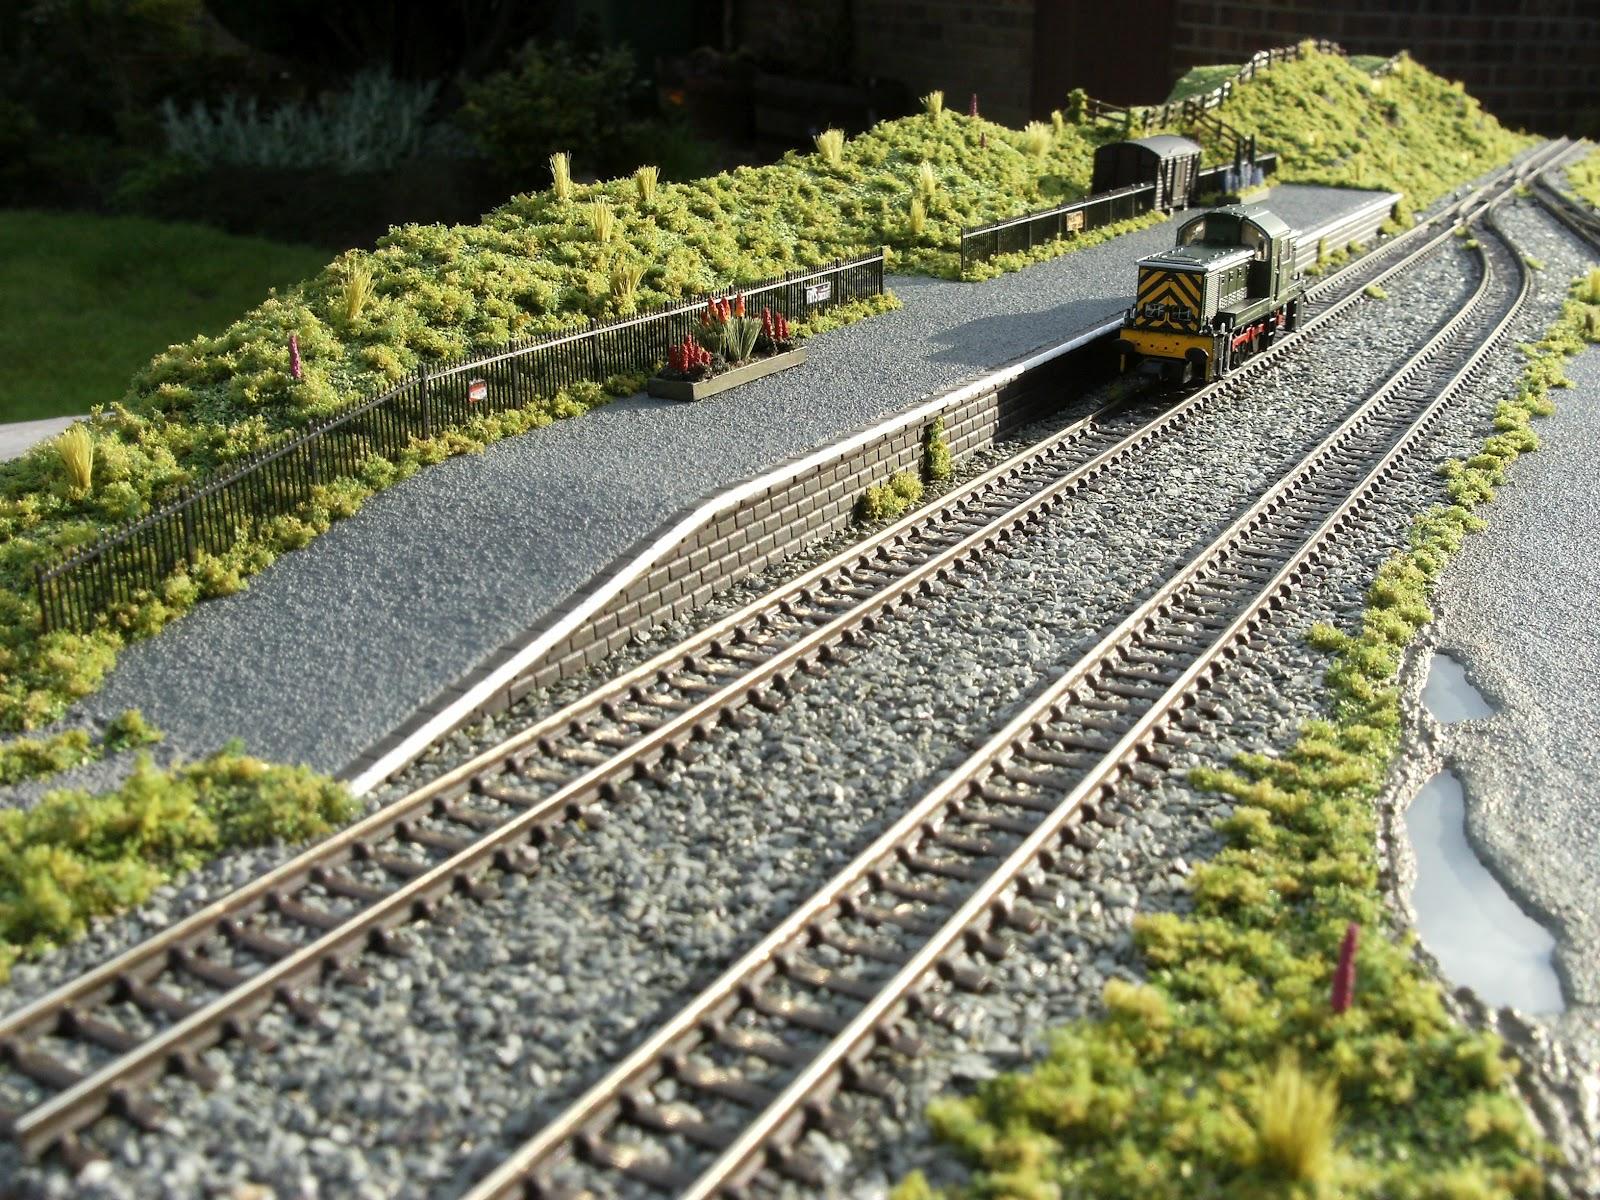 Train and stuff: N gauge model train buildings uk